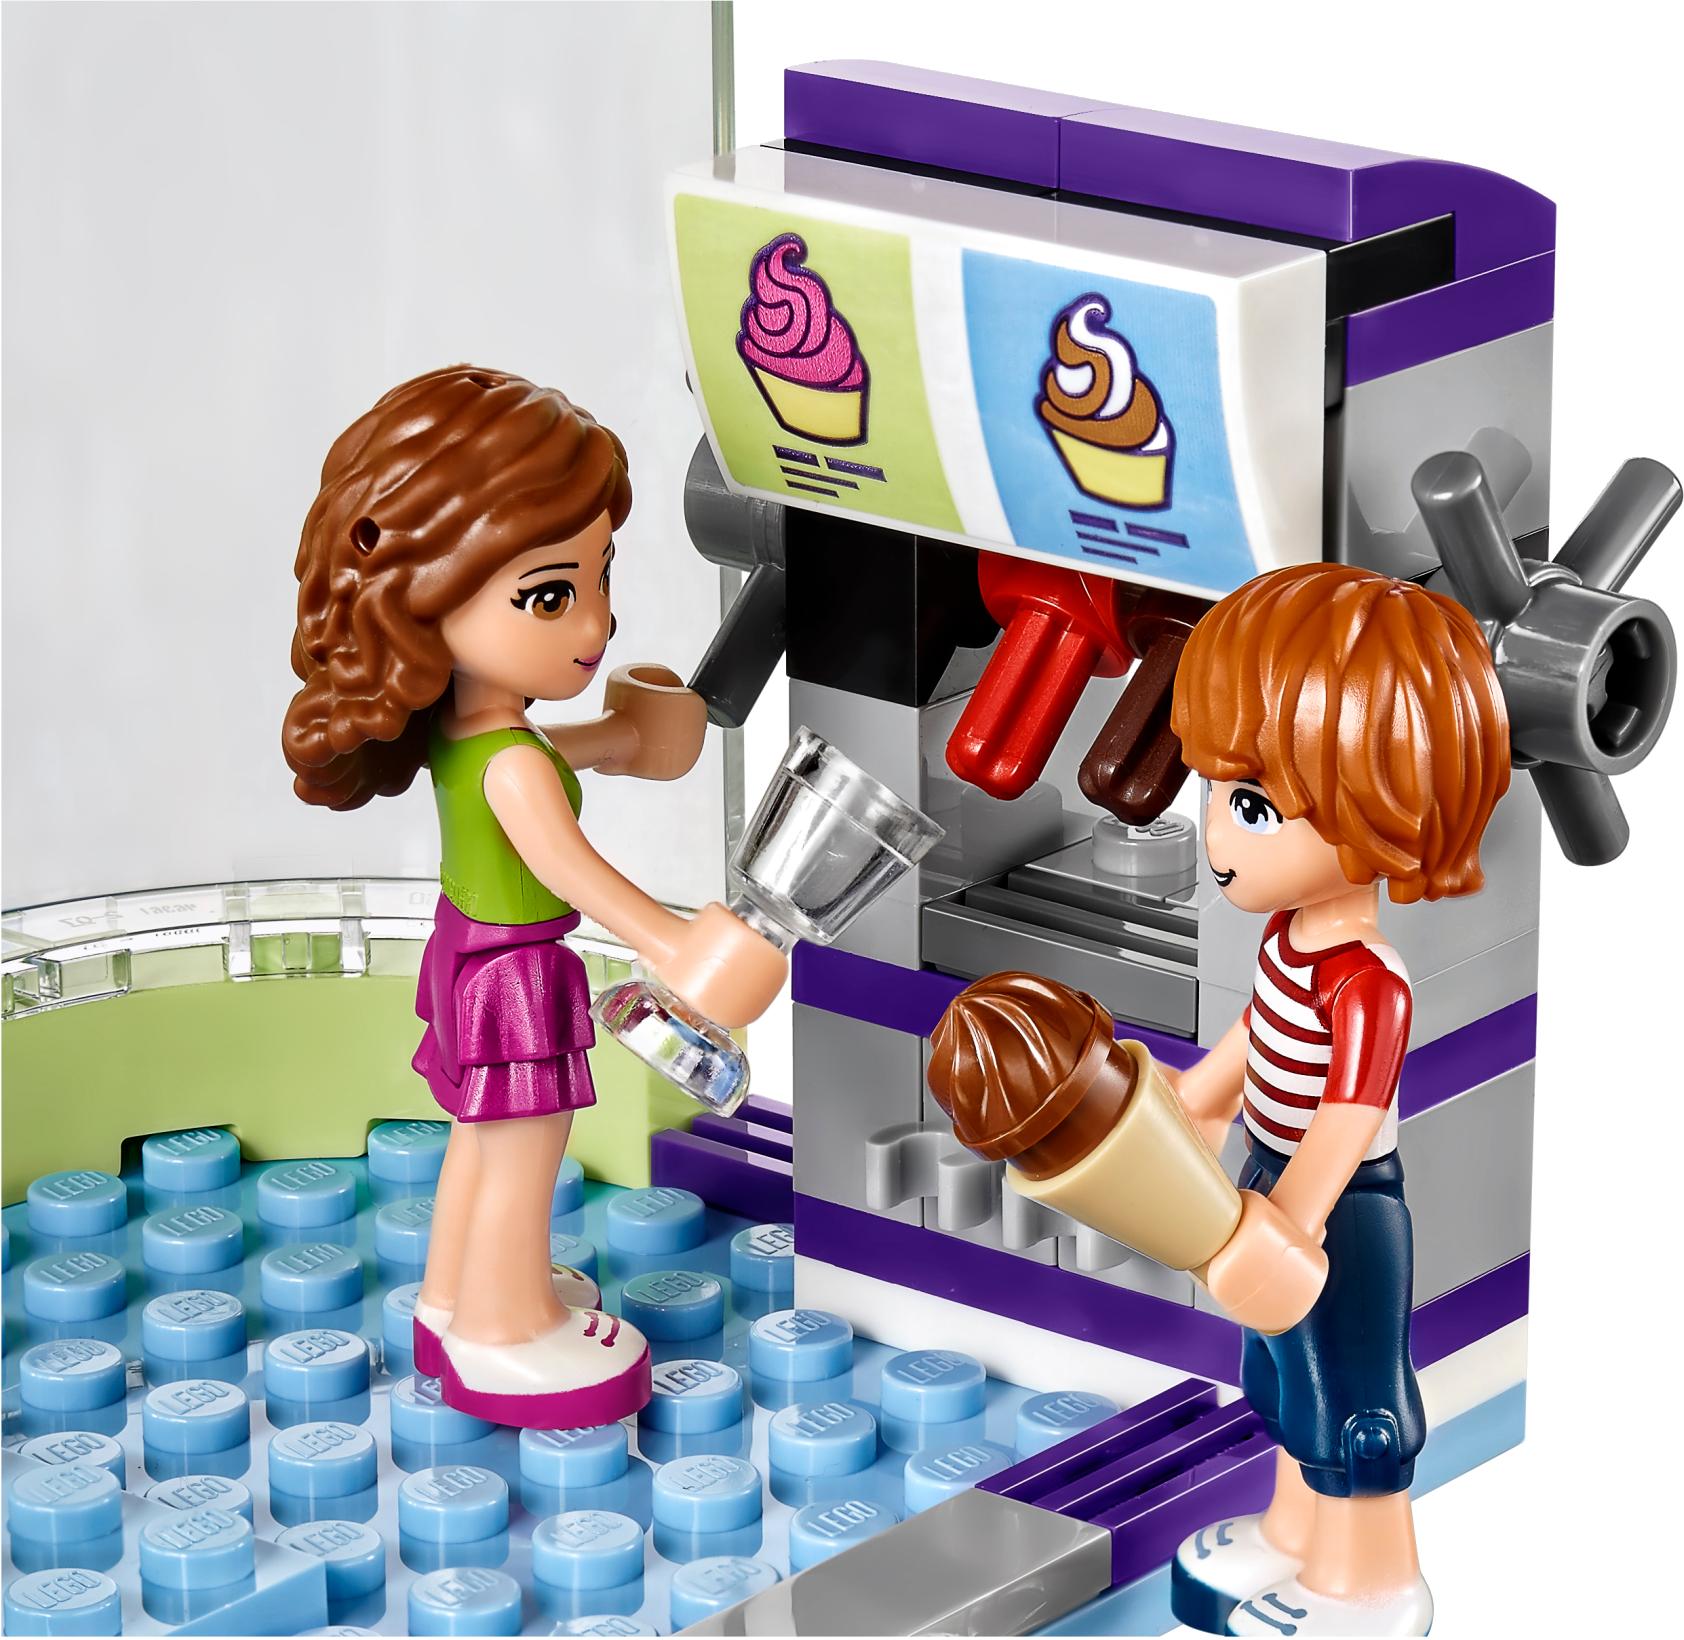 Heartlake Frozen Yogurt Shop